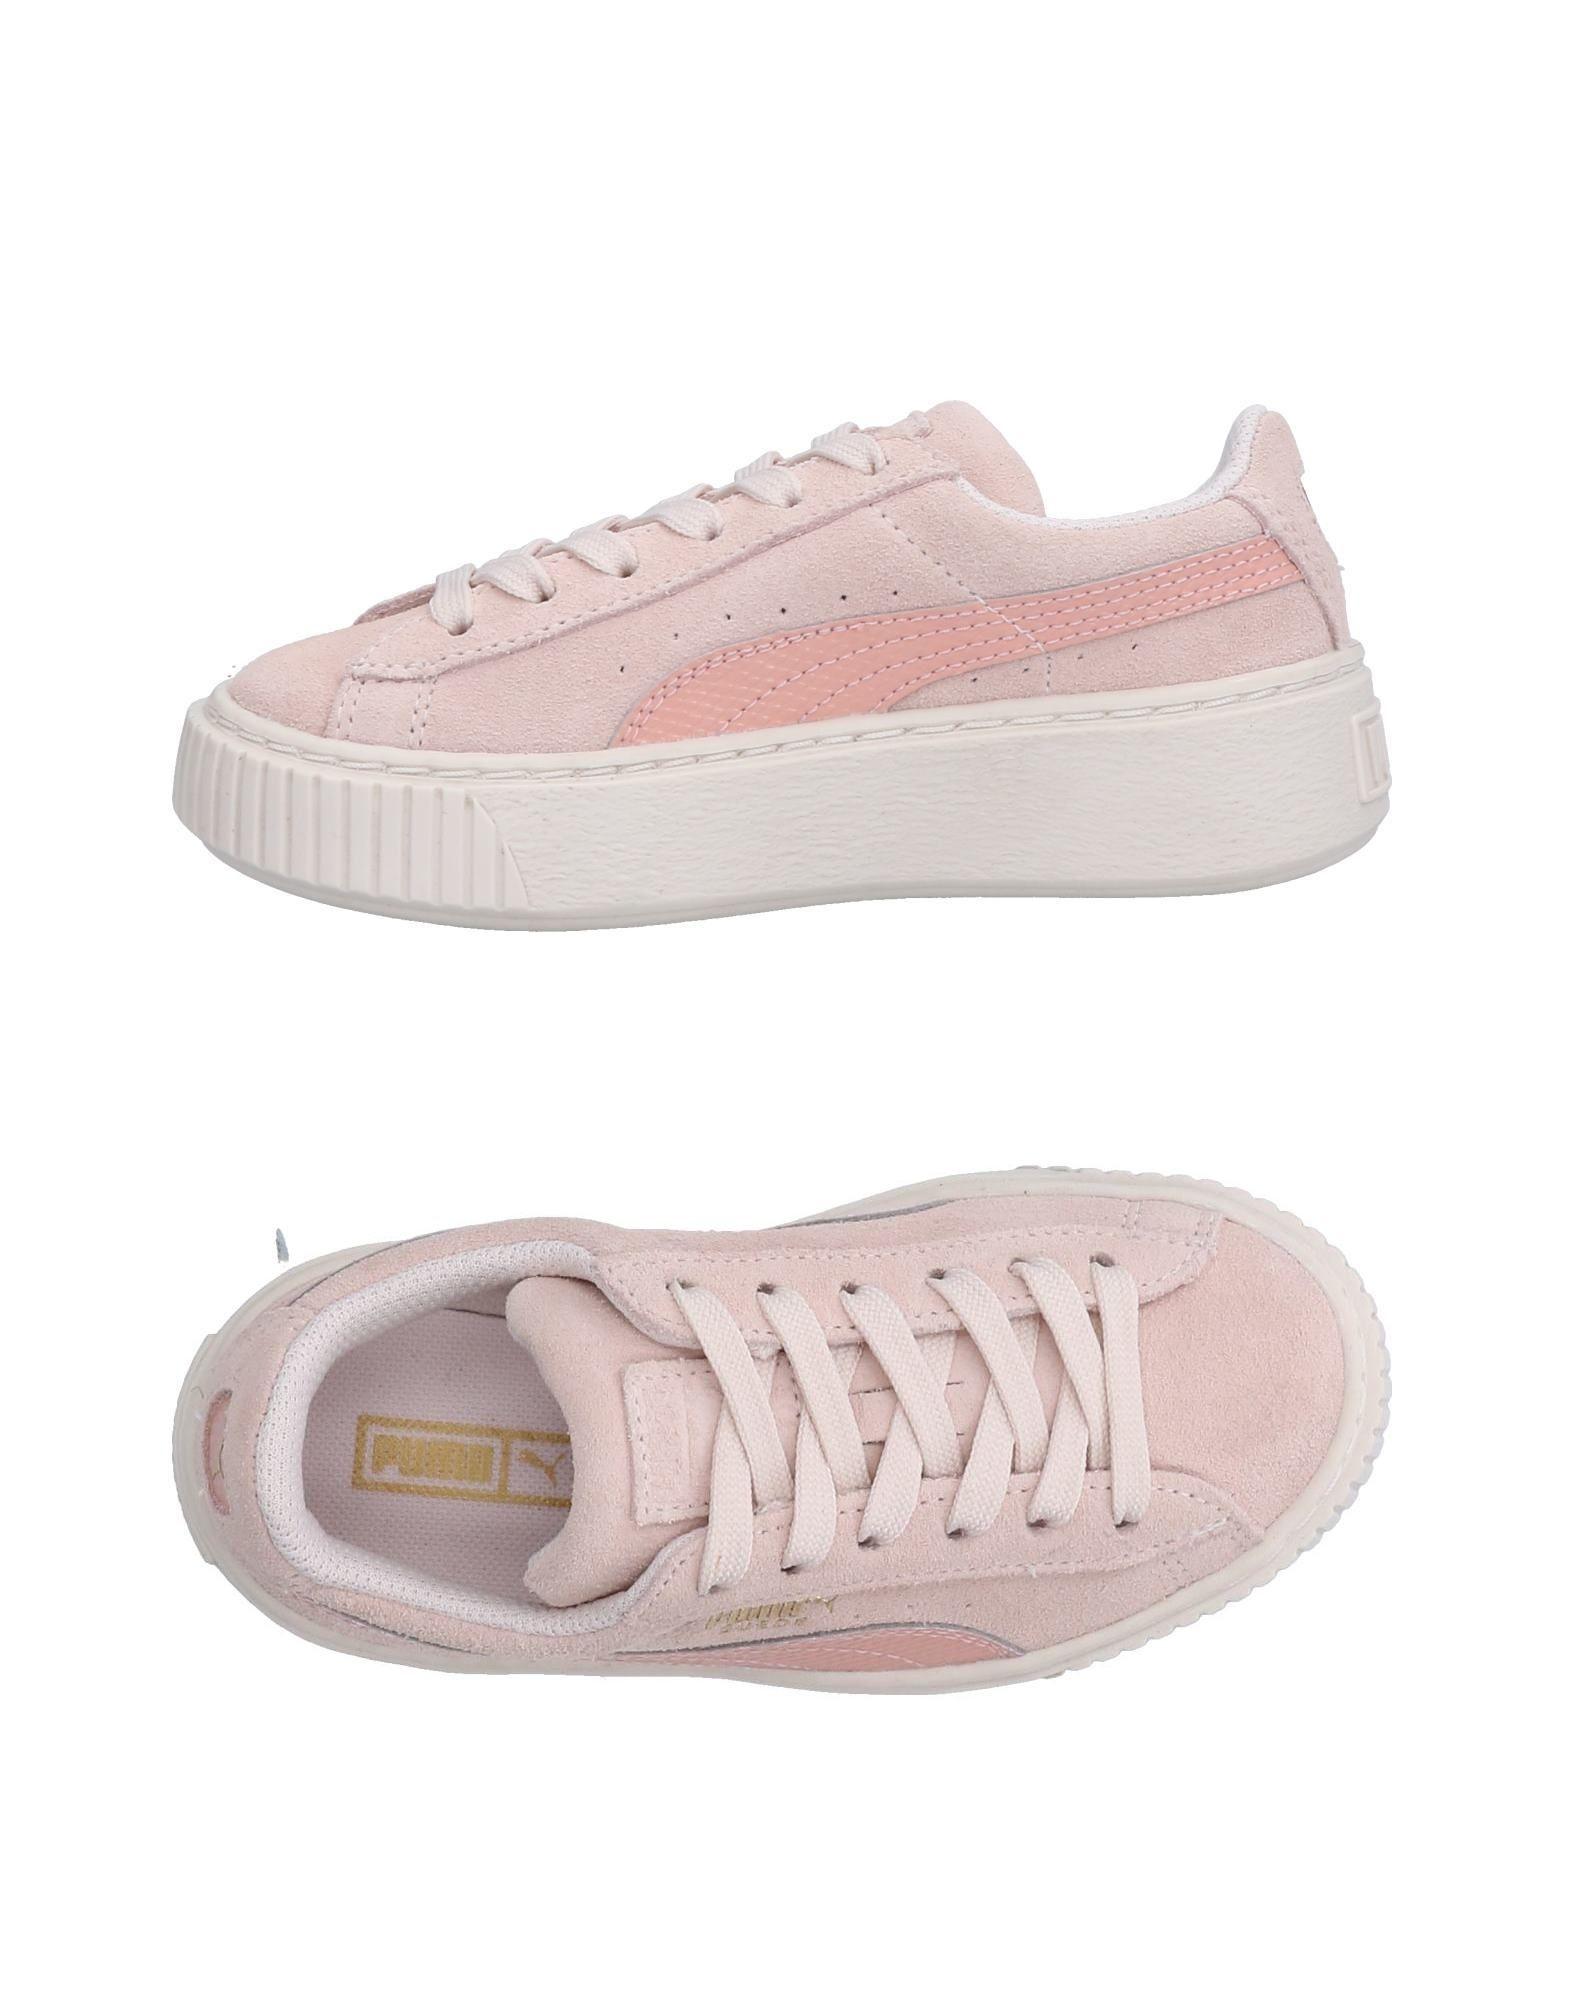 4db04ef607 PUMA ΠΑΠΟΥΤΣΙΑ Παπούτσια τένις χαμηλά